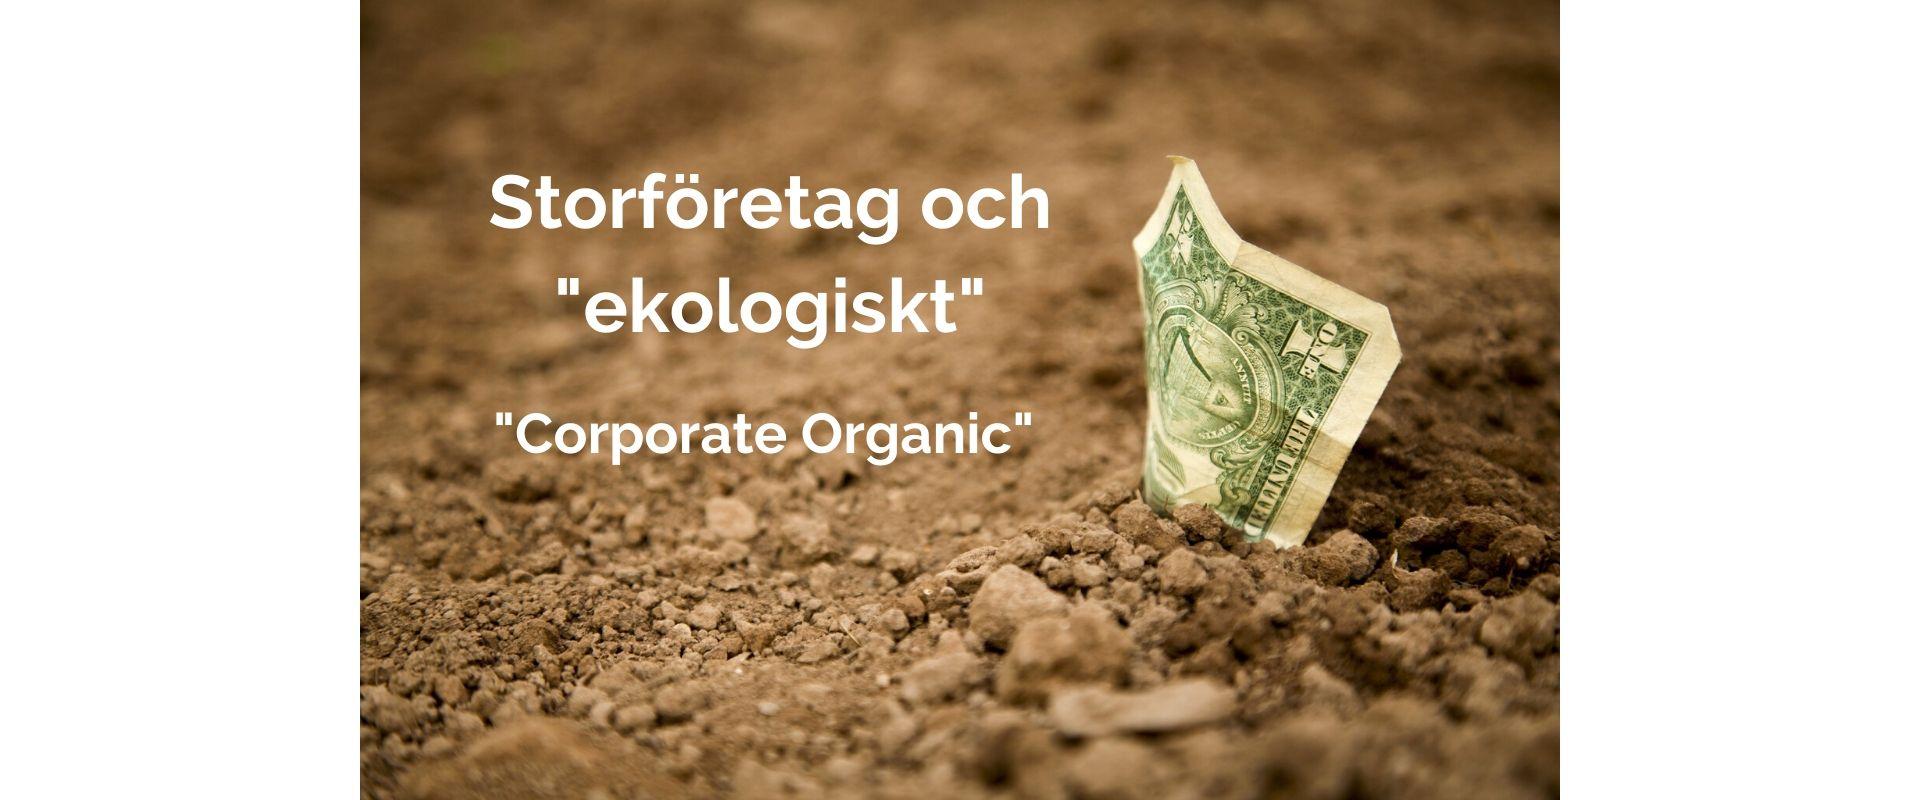 Corporate Organic